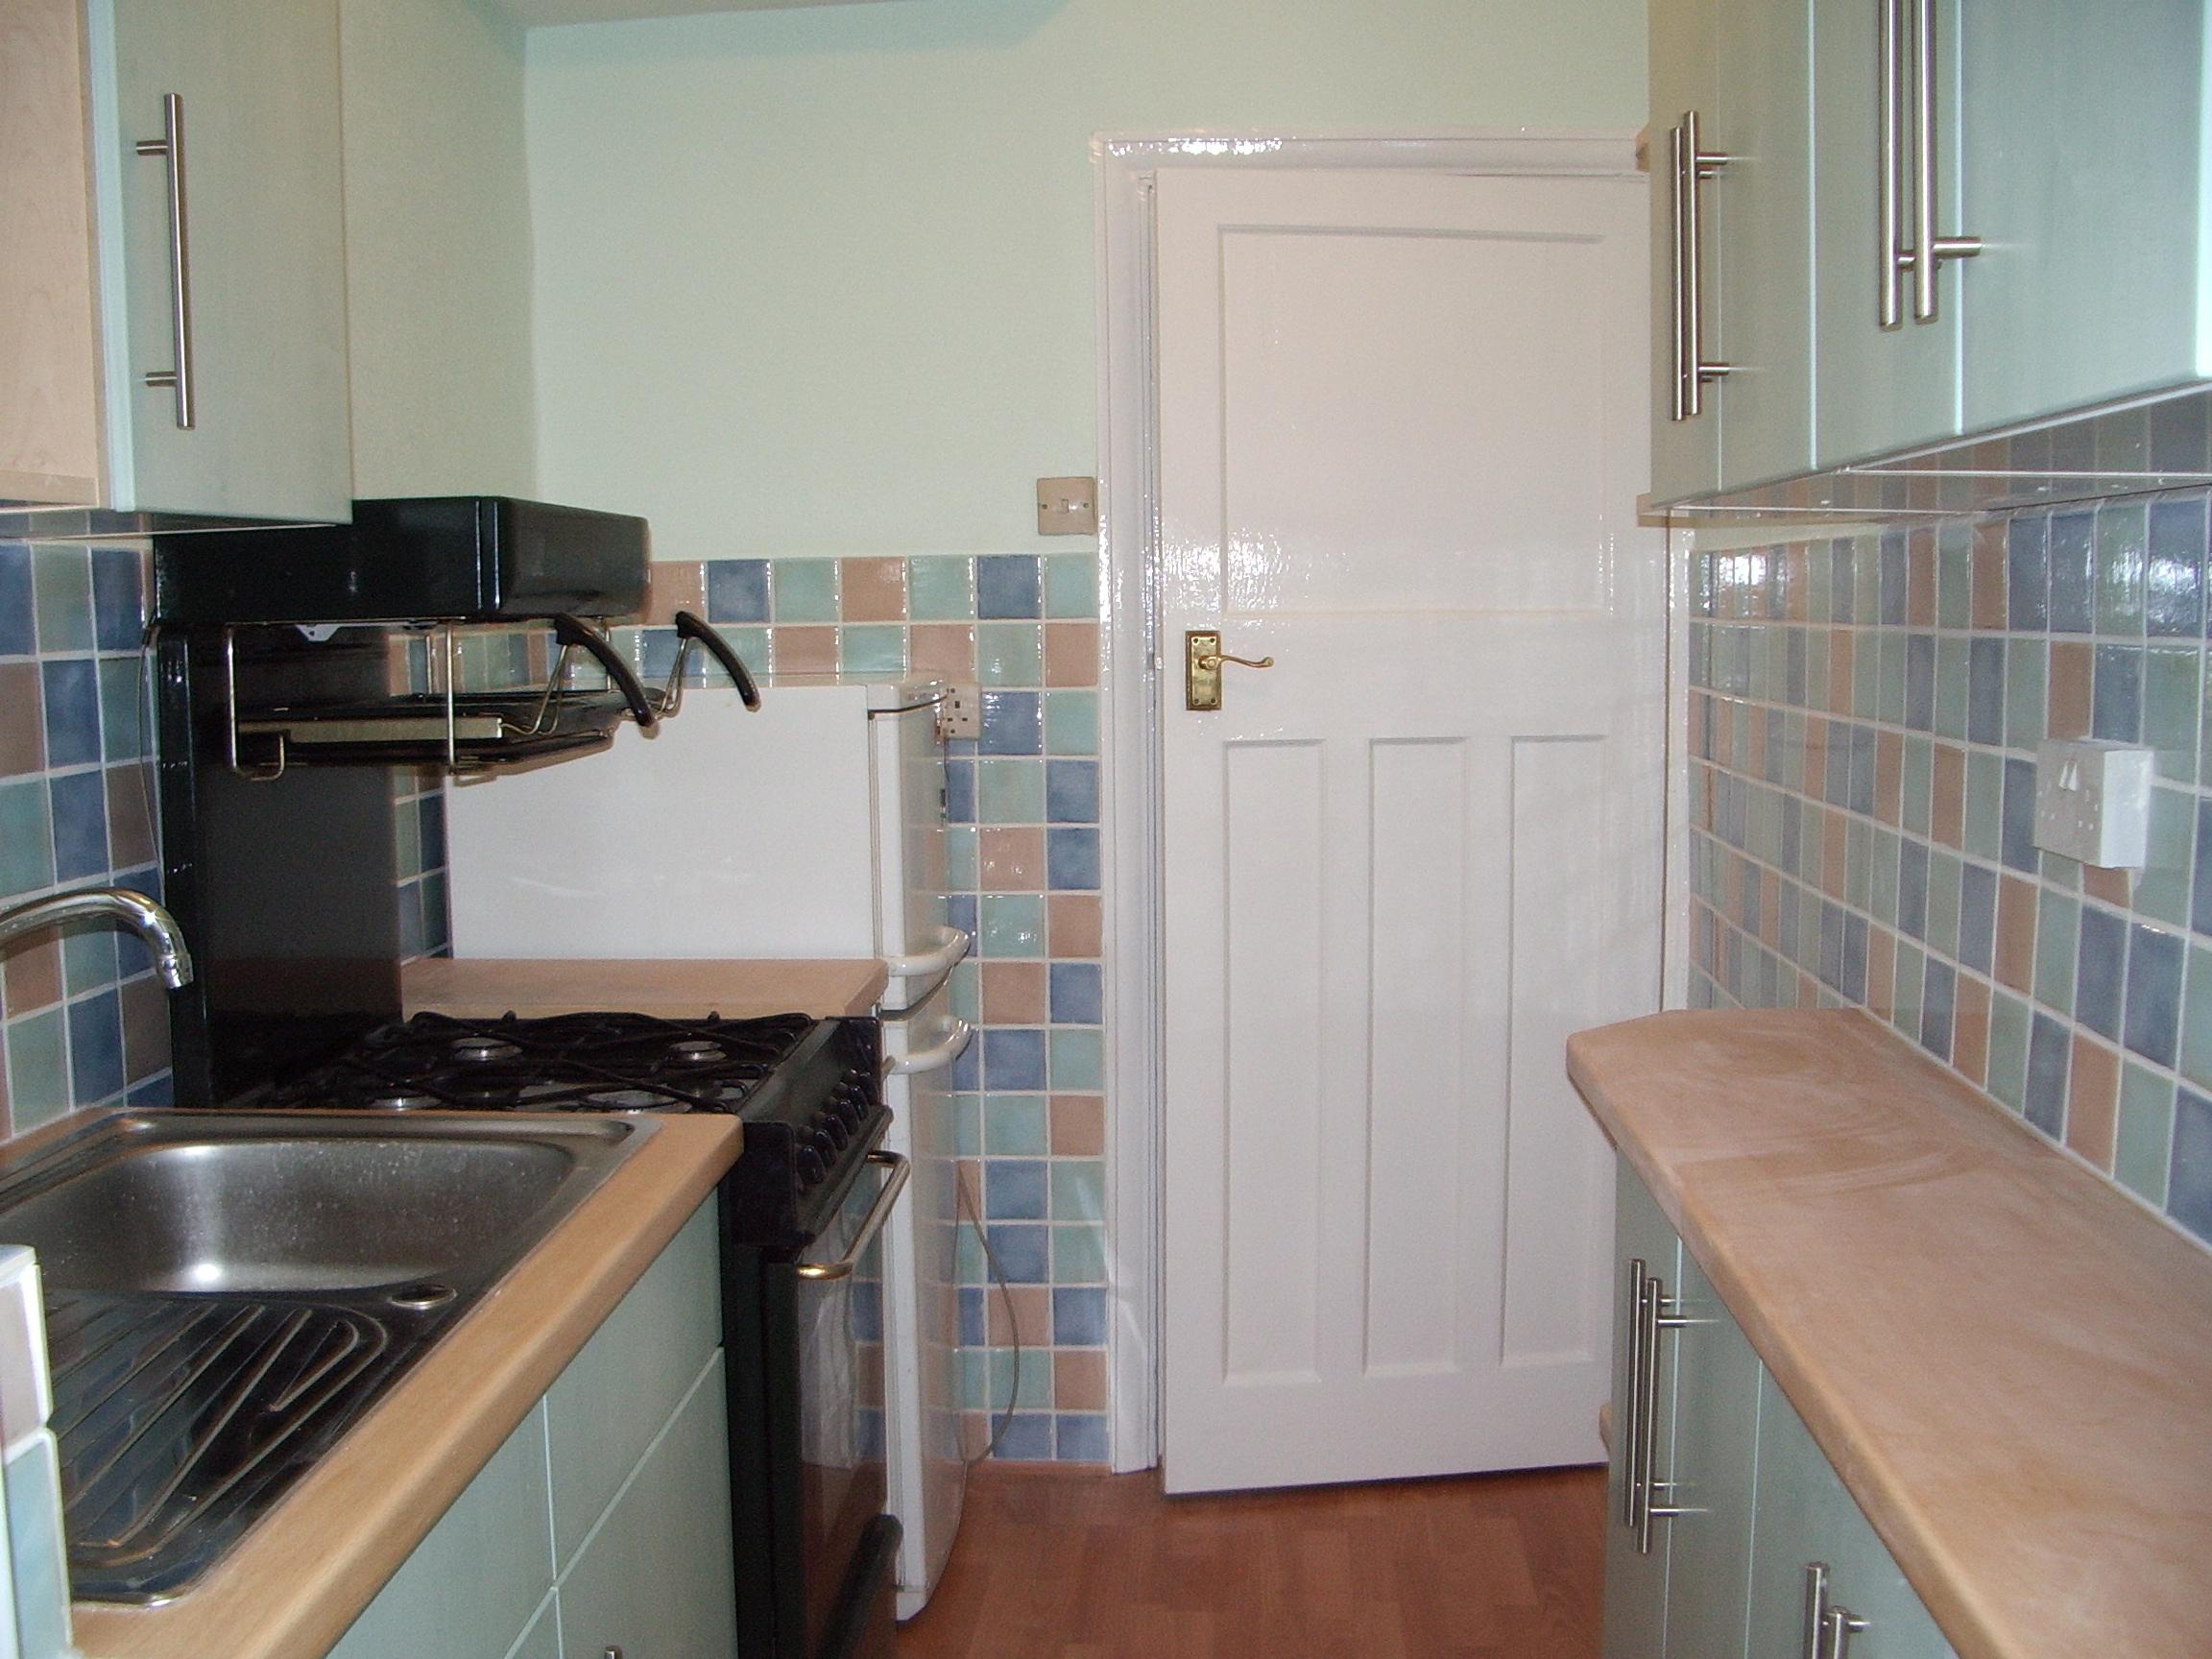 Mike walton property maintenance plumbing kitchen design for Beech effect kitchen units